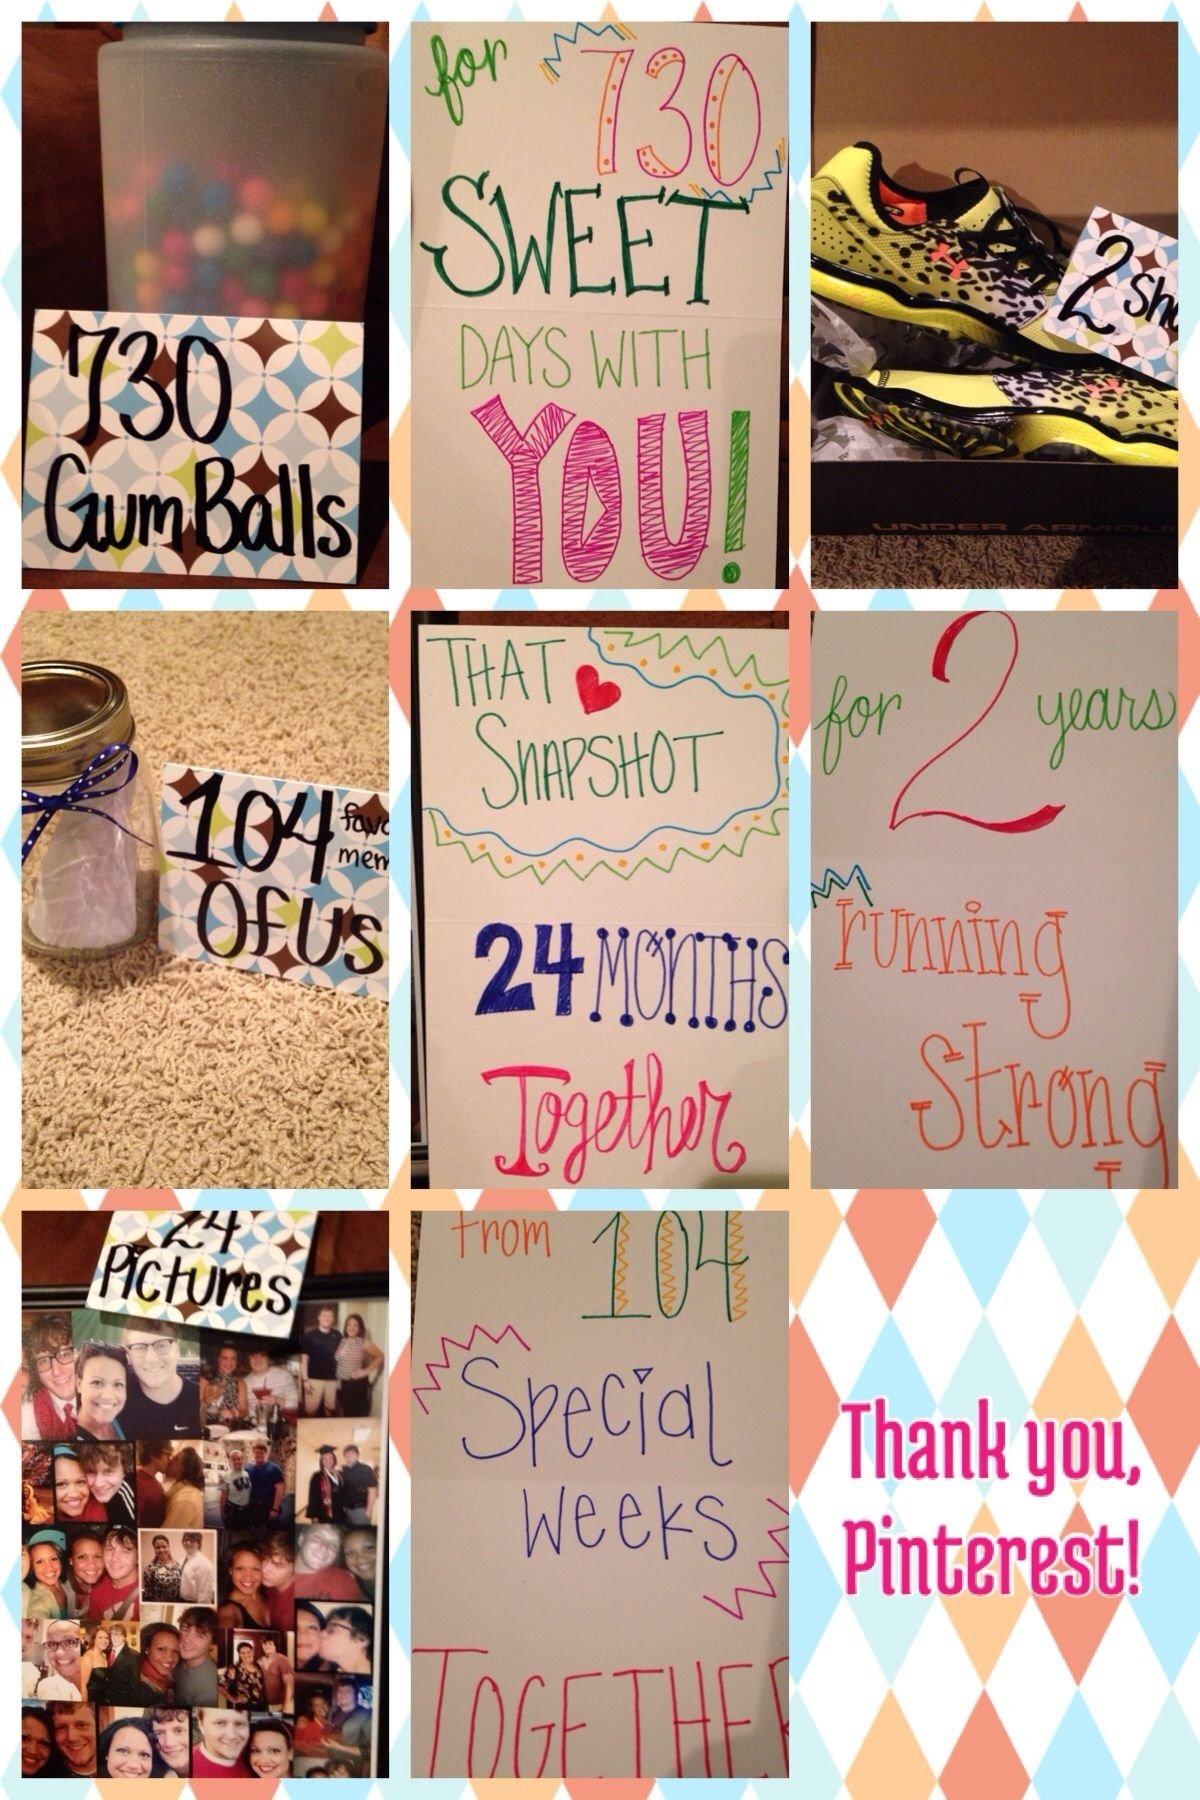 10 Beautiful Two Year Anniversary Gift Ideas remake 2 year anniversary idea he loved it gift ideas 4 2020